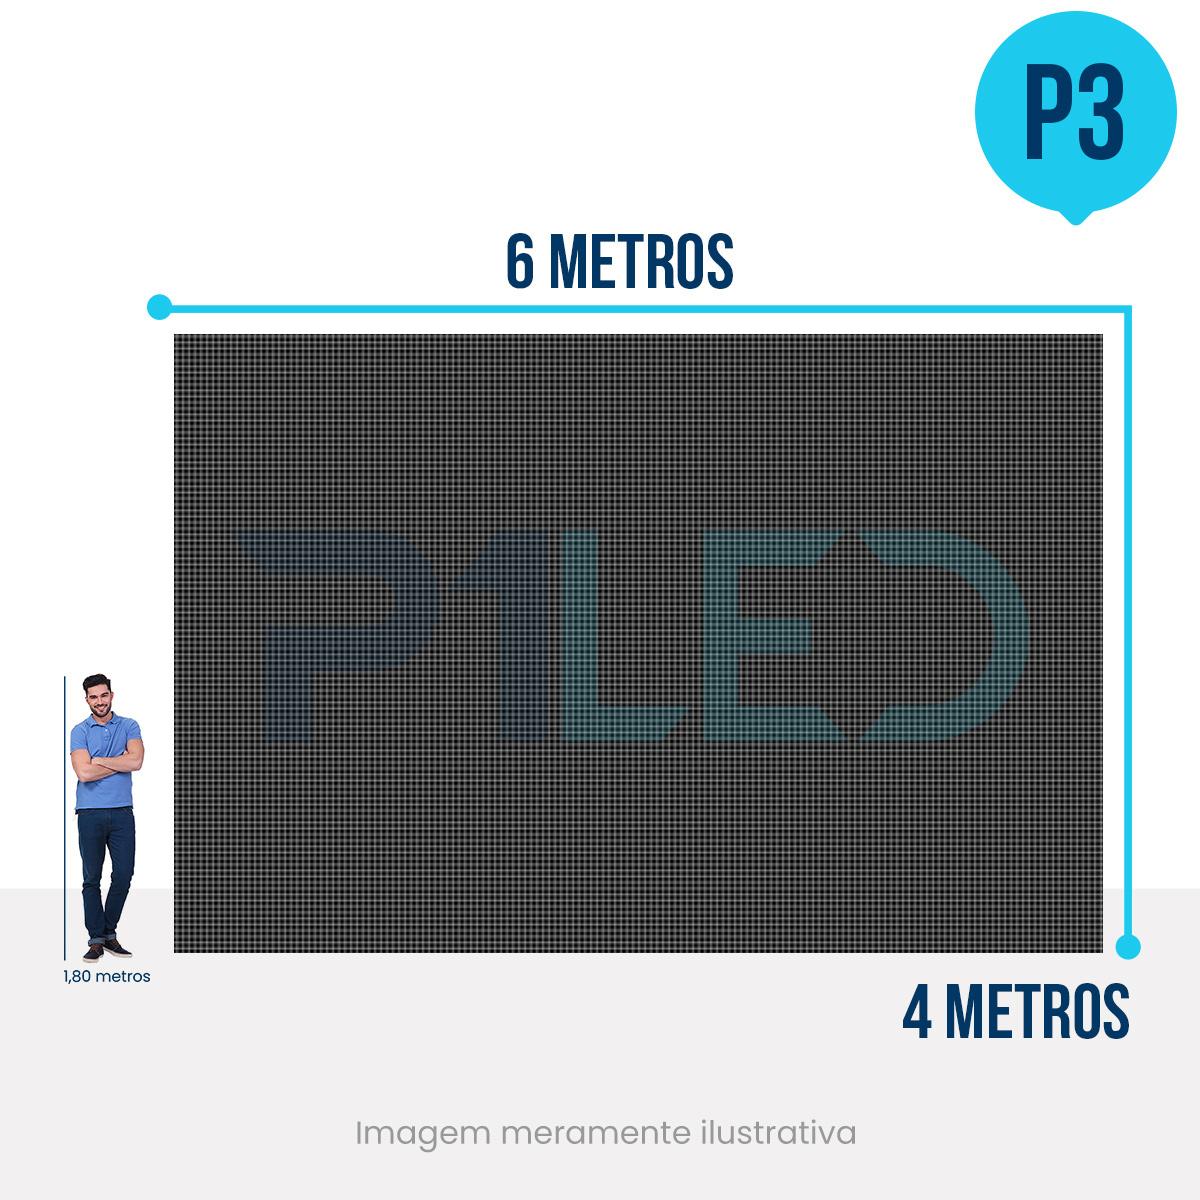 Painel de LED para Vitrine 6x4 - Telão P3 Outdoor  - Painel e Telão de LED - O Melhor Preço em Painel de LED | P1LED